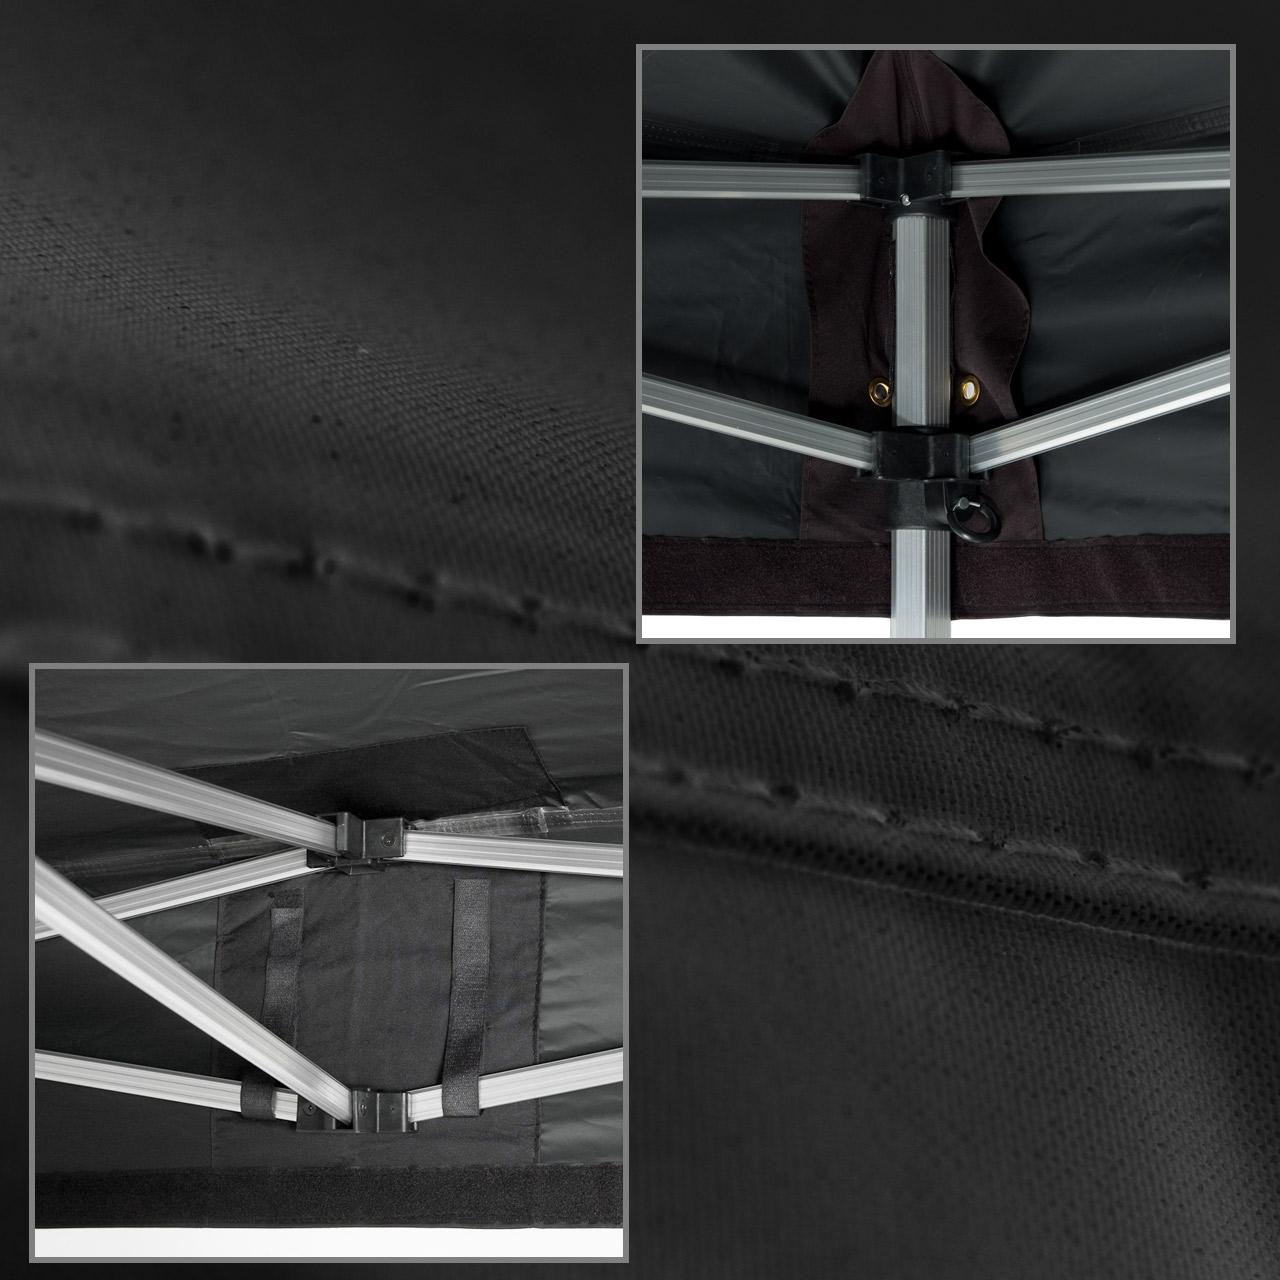 Profifaltpavillon-Plane-schwarz58b025461073c